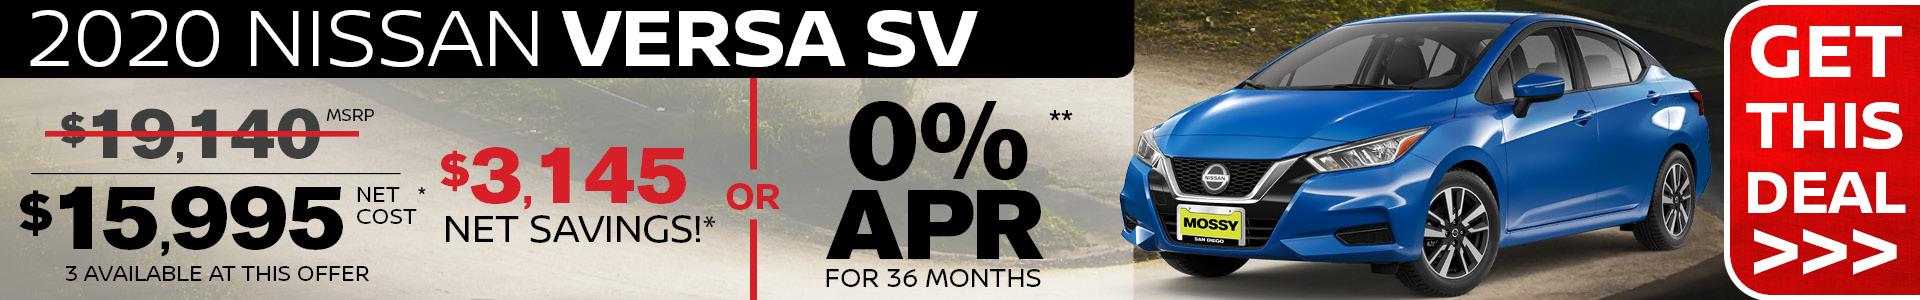 Mossy Nissan - Versa SRP